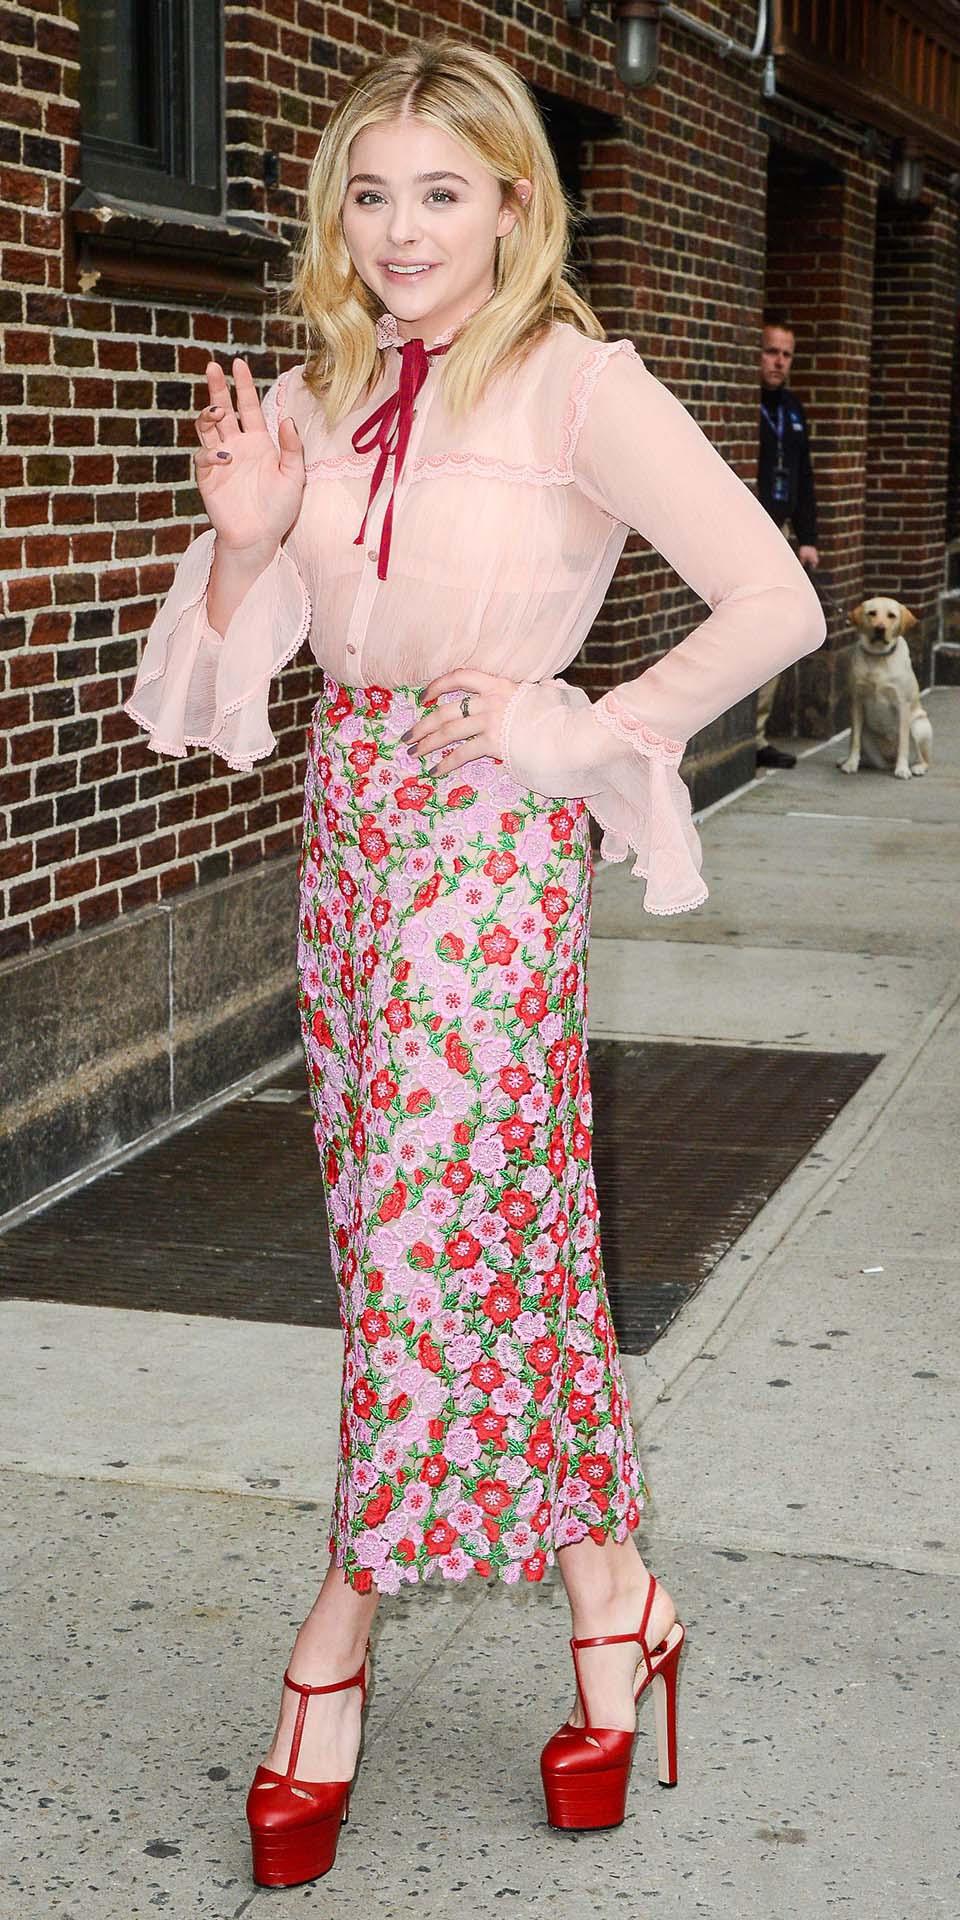 pink-light-midi-skirt-pink-light-top-blouse-peasant-floral-print-red-shoe-pumps-spring-summer-blonde-dinner.jpg